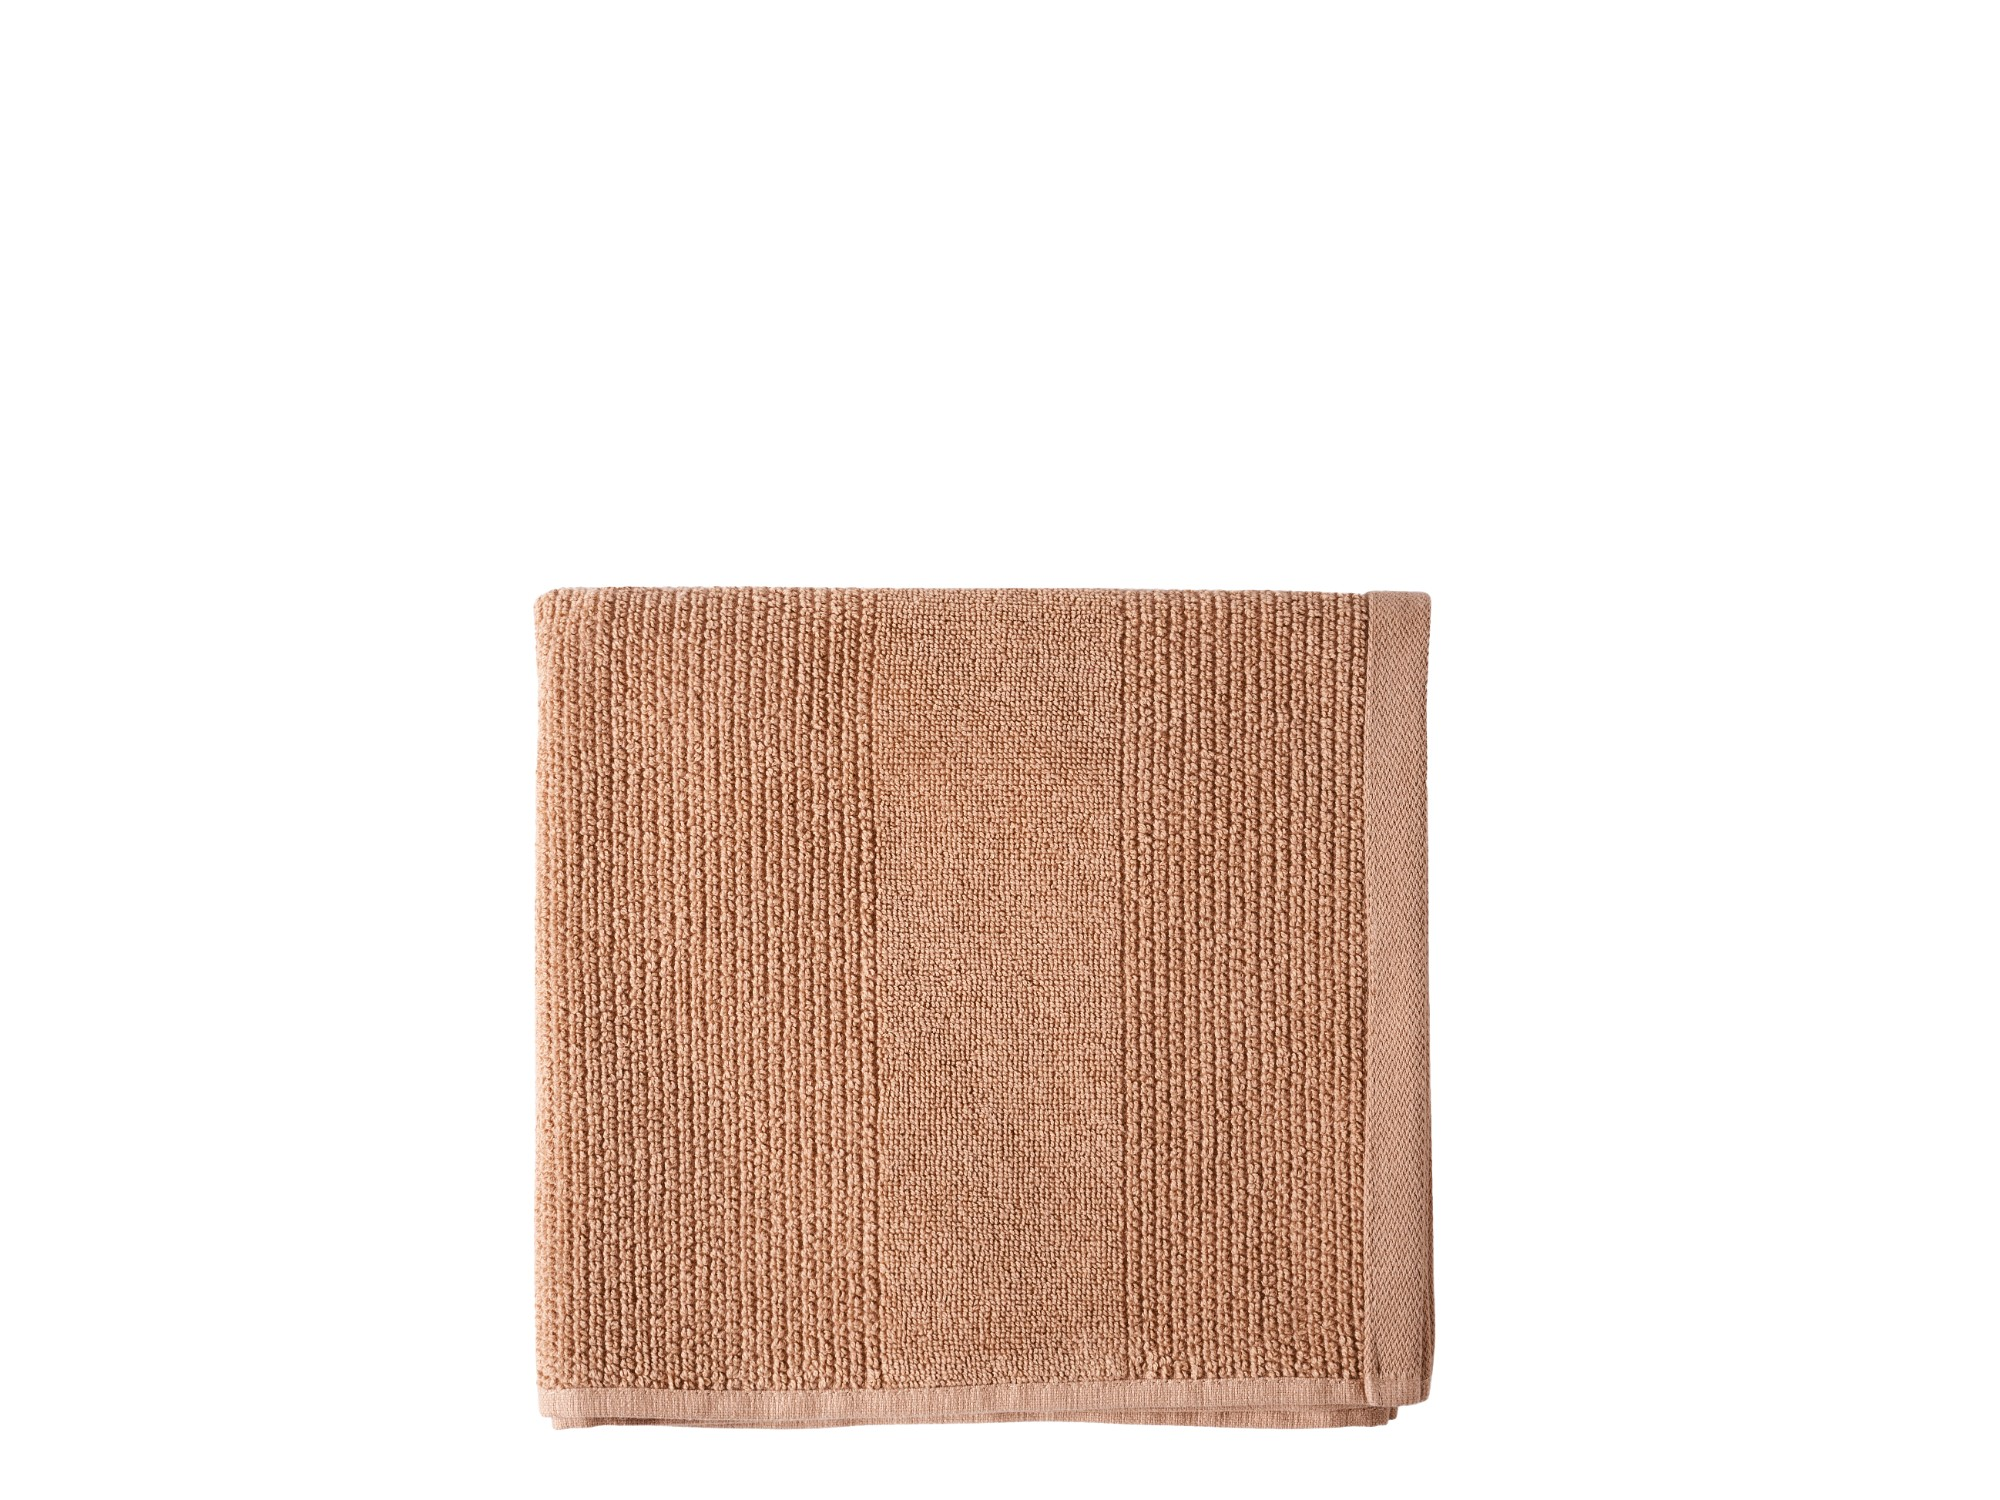 Södahl Sense håndklæde, 50x100 cm, pudder